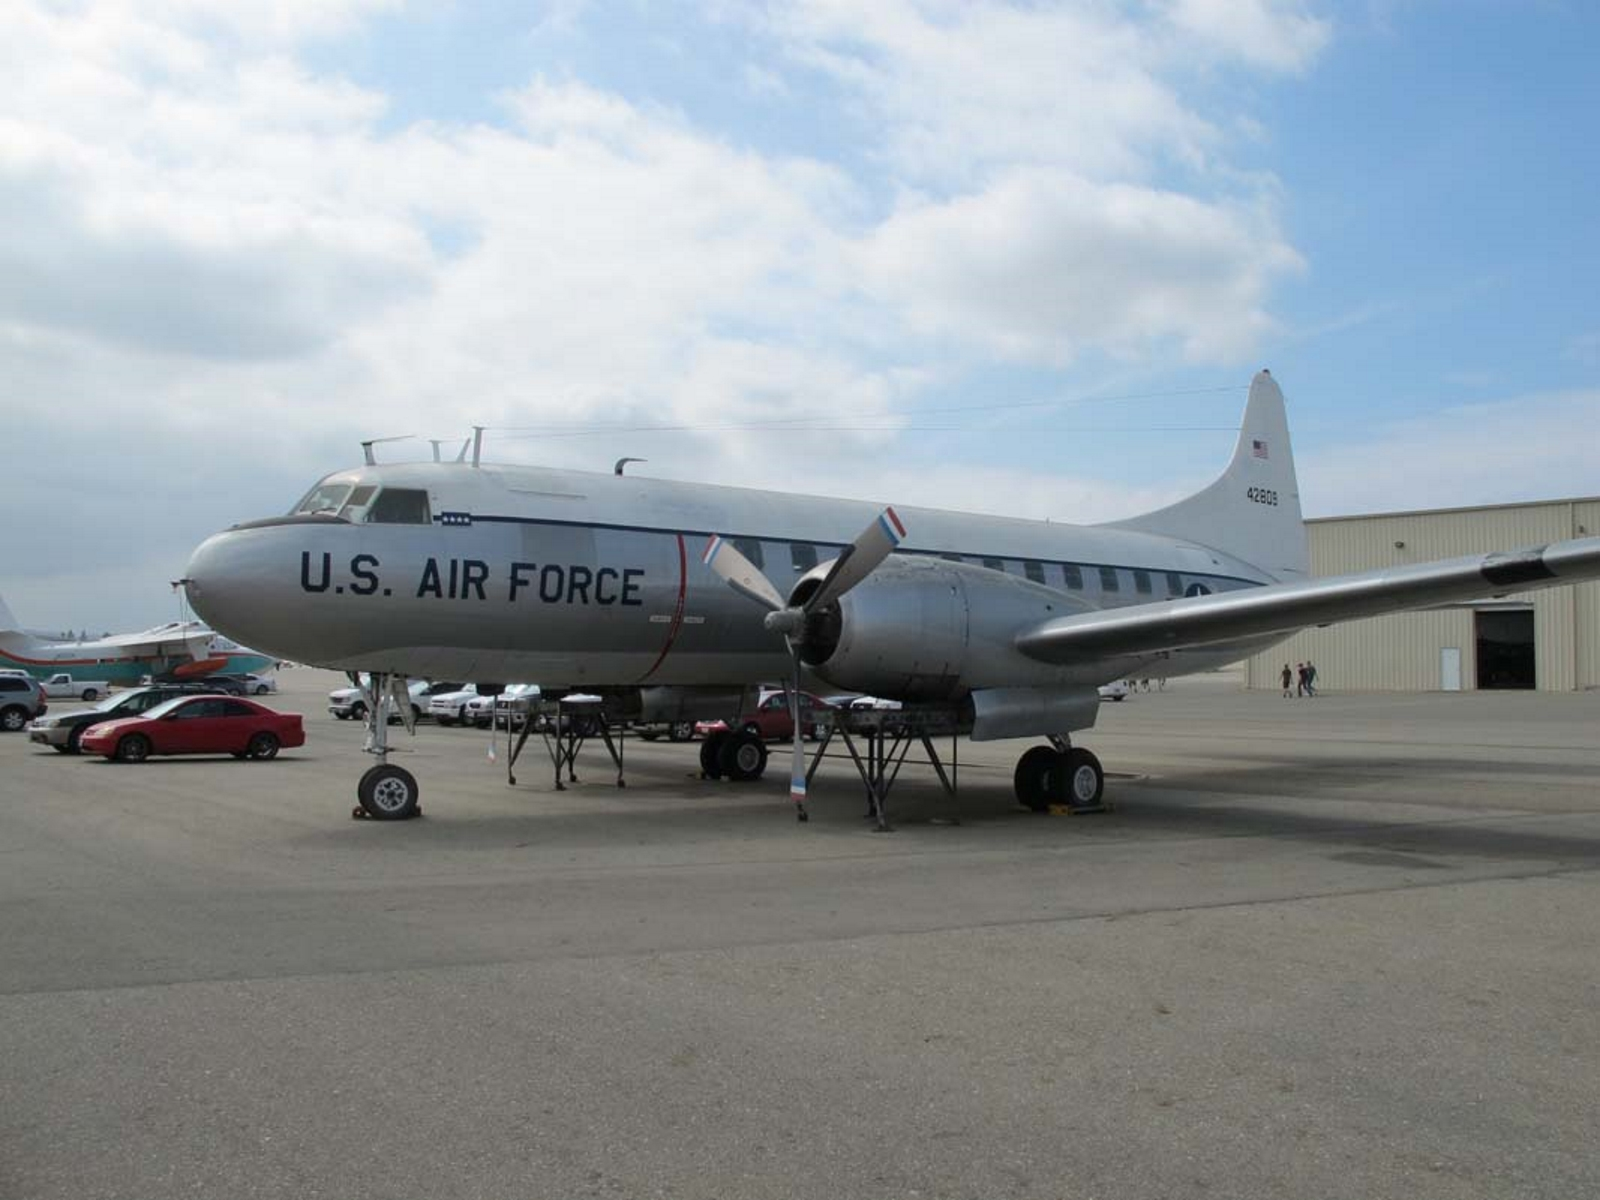 Convair C-131D Samaritaner